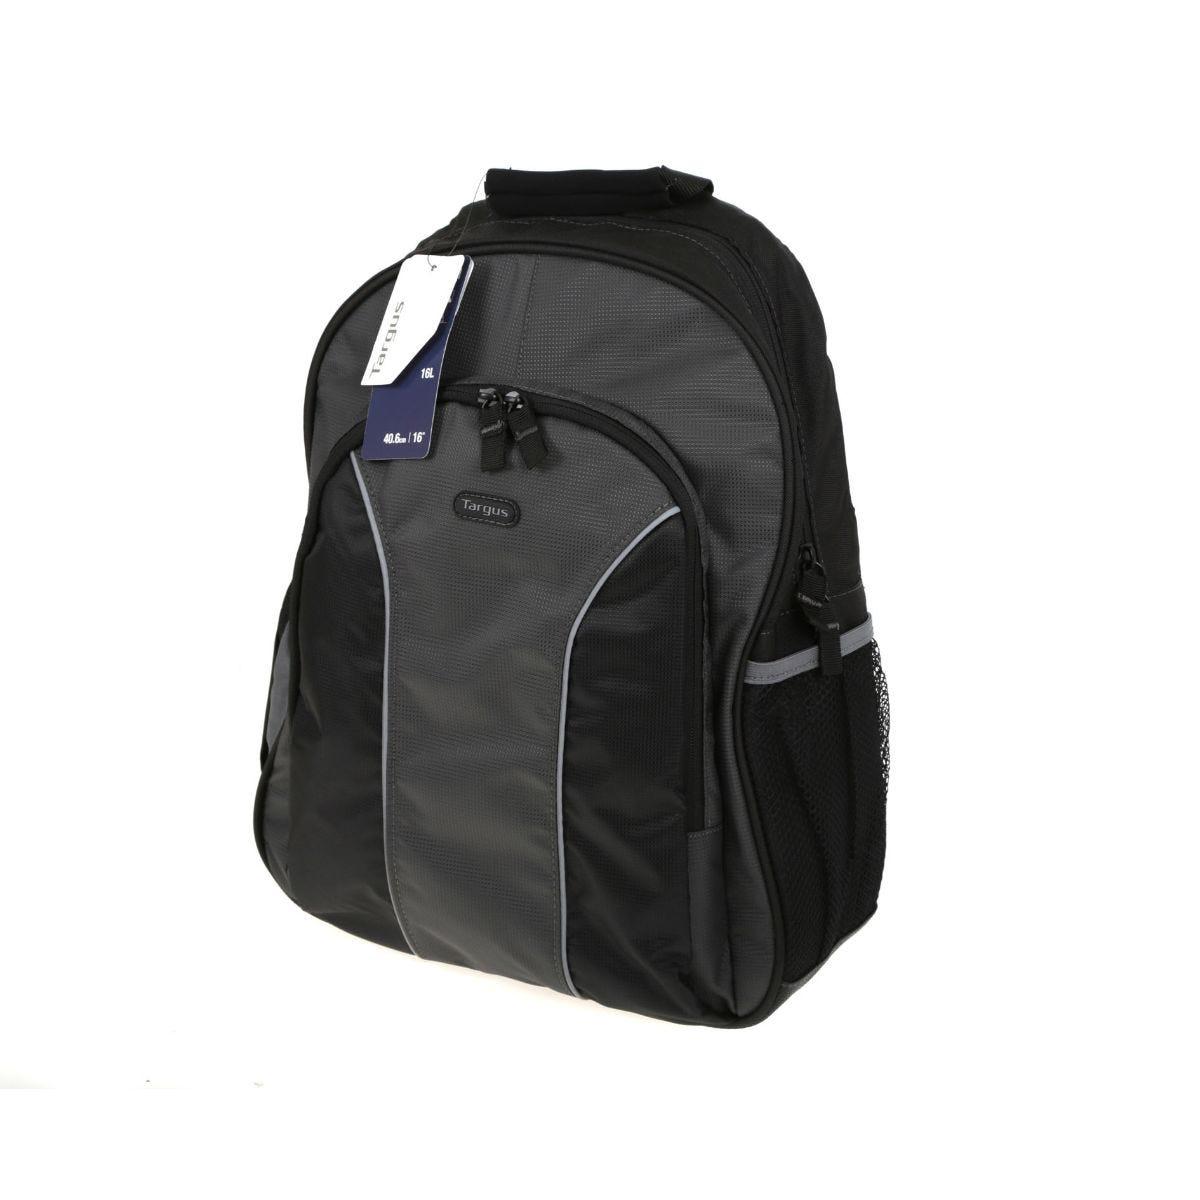 Image of Targus Essential Laptop Backpack 16 Inch, Blk/Grey